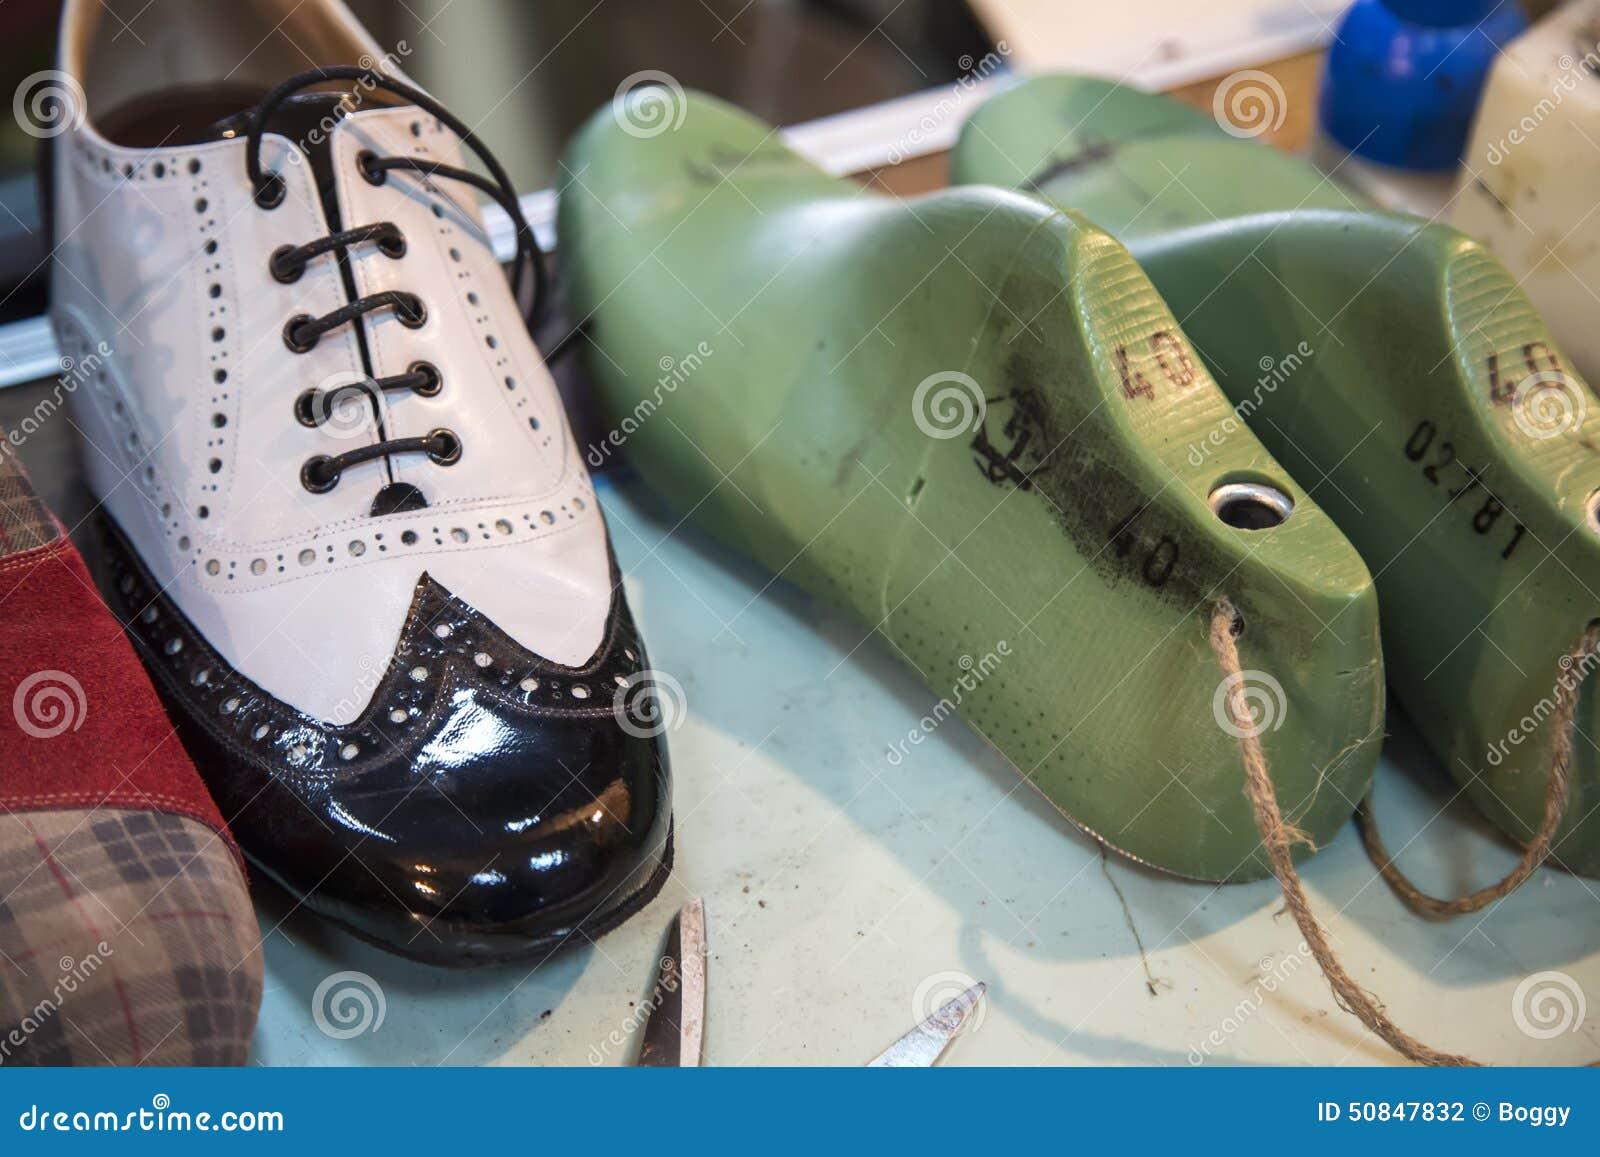 Shoe making stock photo  Image of handwork, hand, model - 50847832